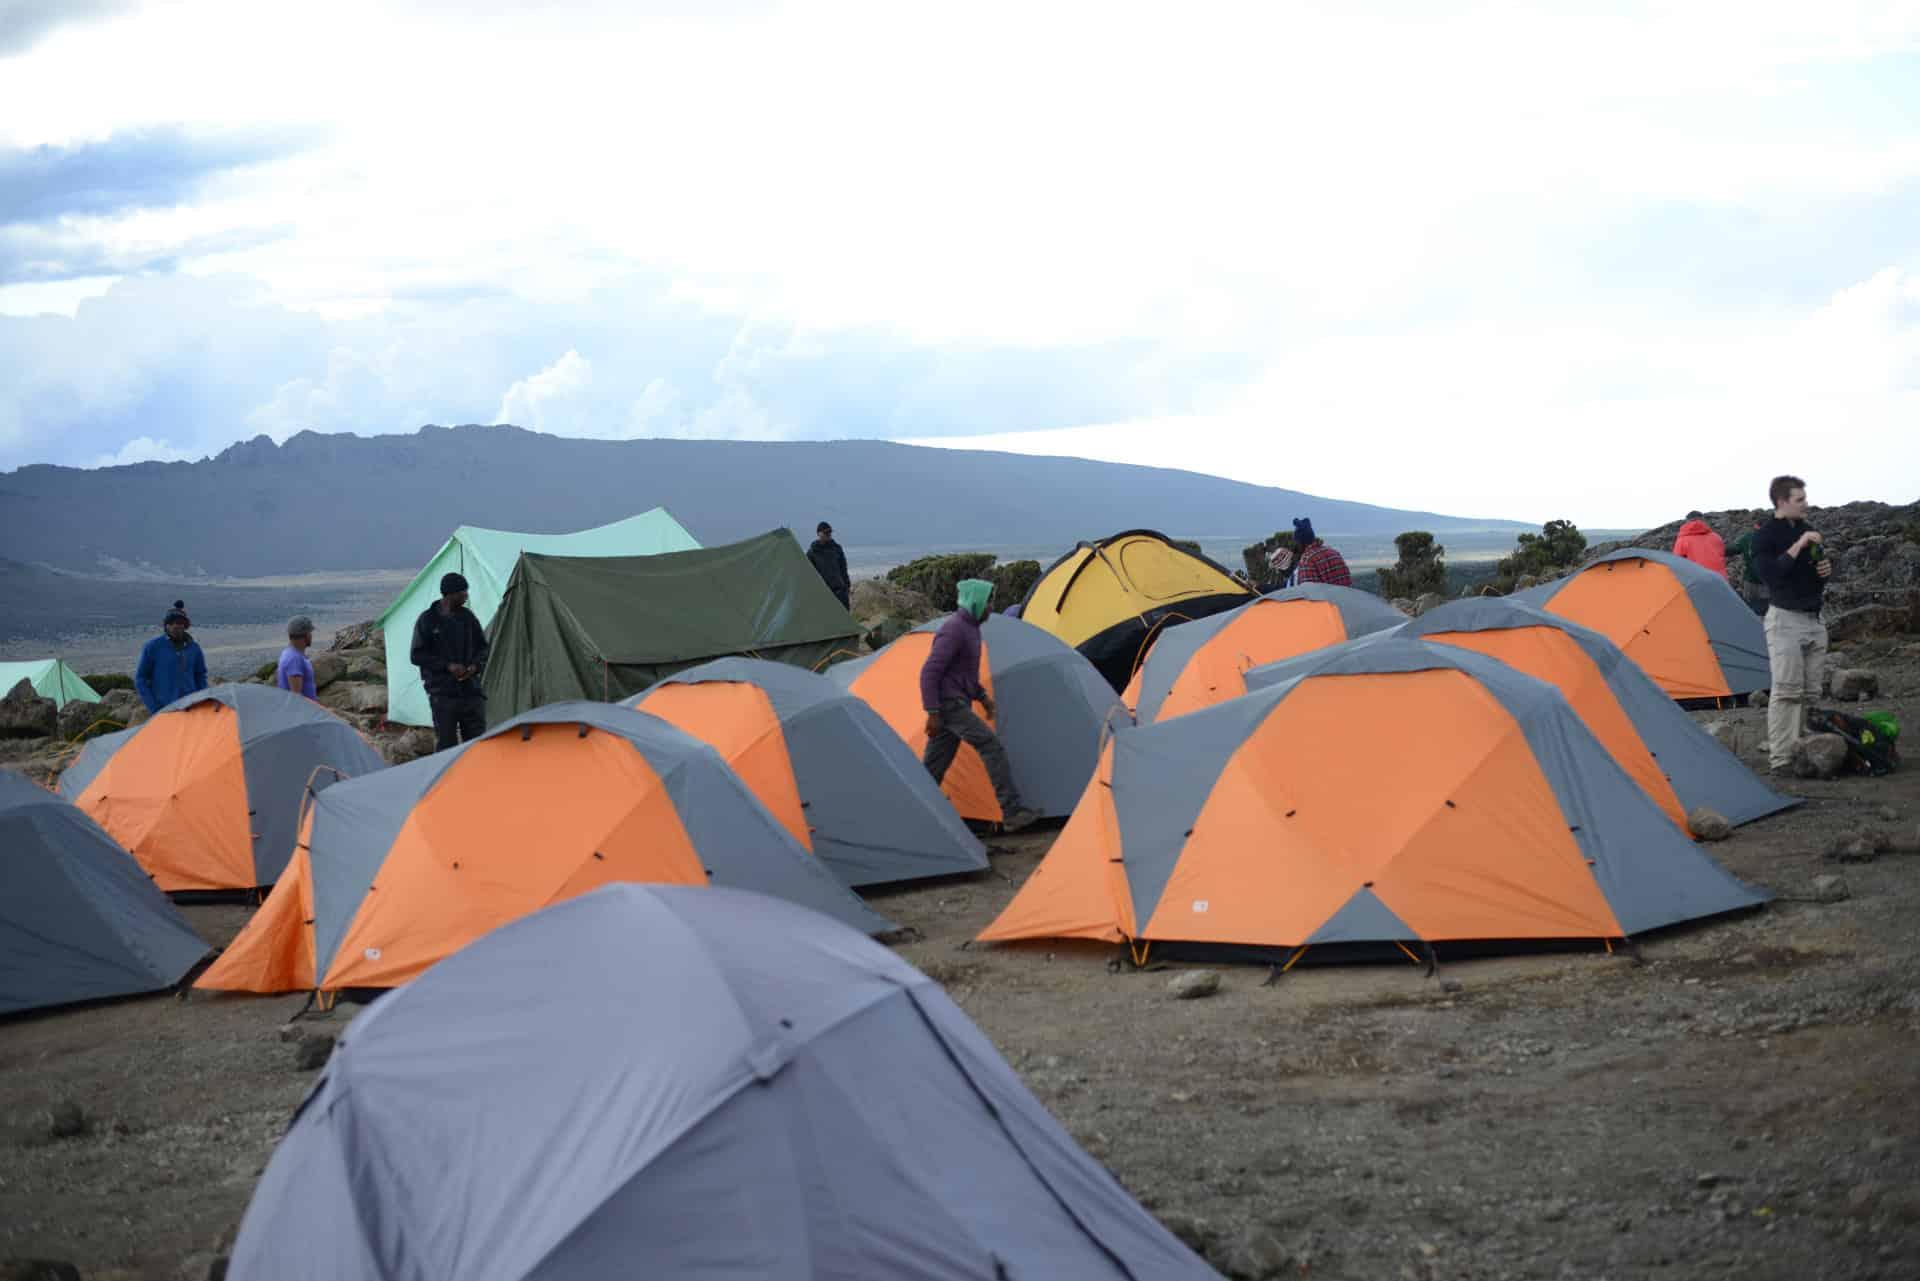 Kilimanjaro Lemosho Climb